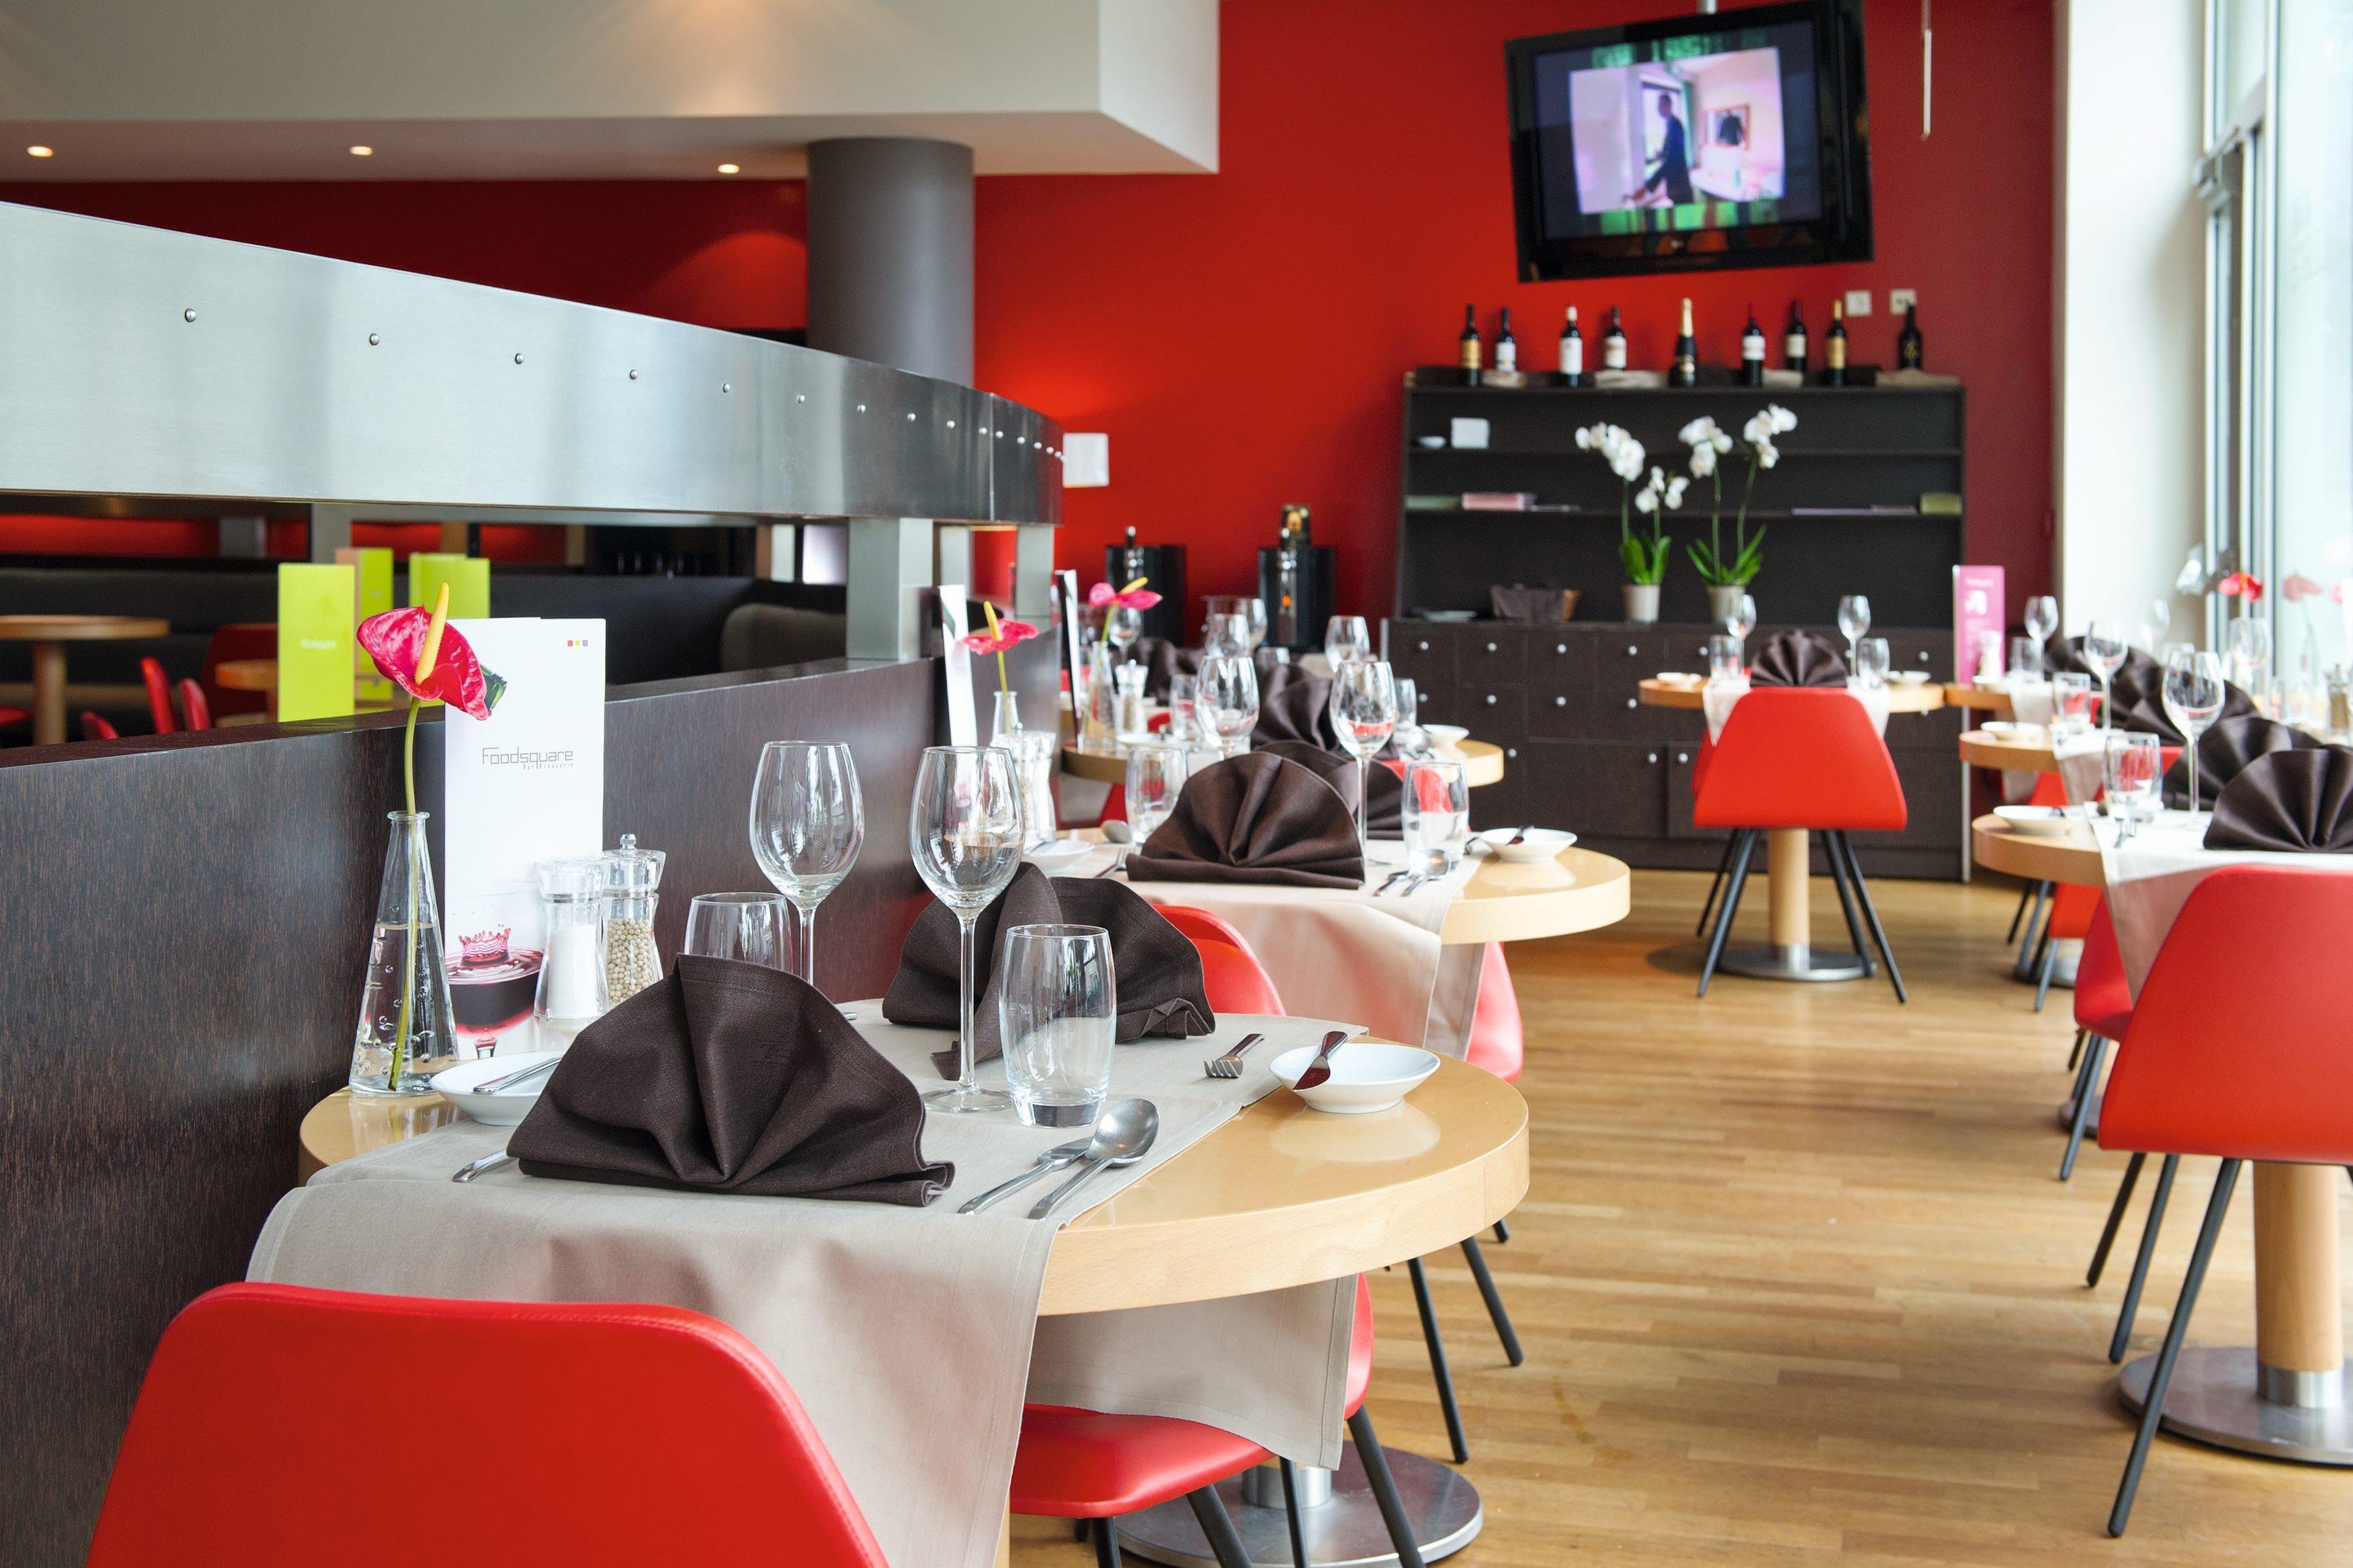 Restaurant Novotel Leuven Centrum Leuven.jpg